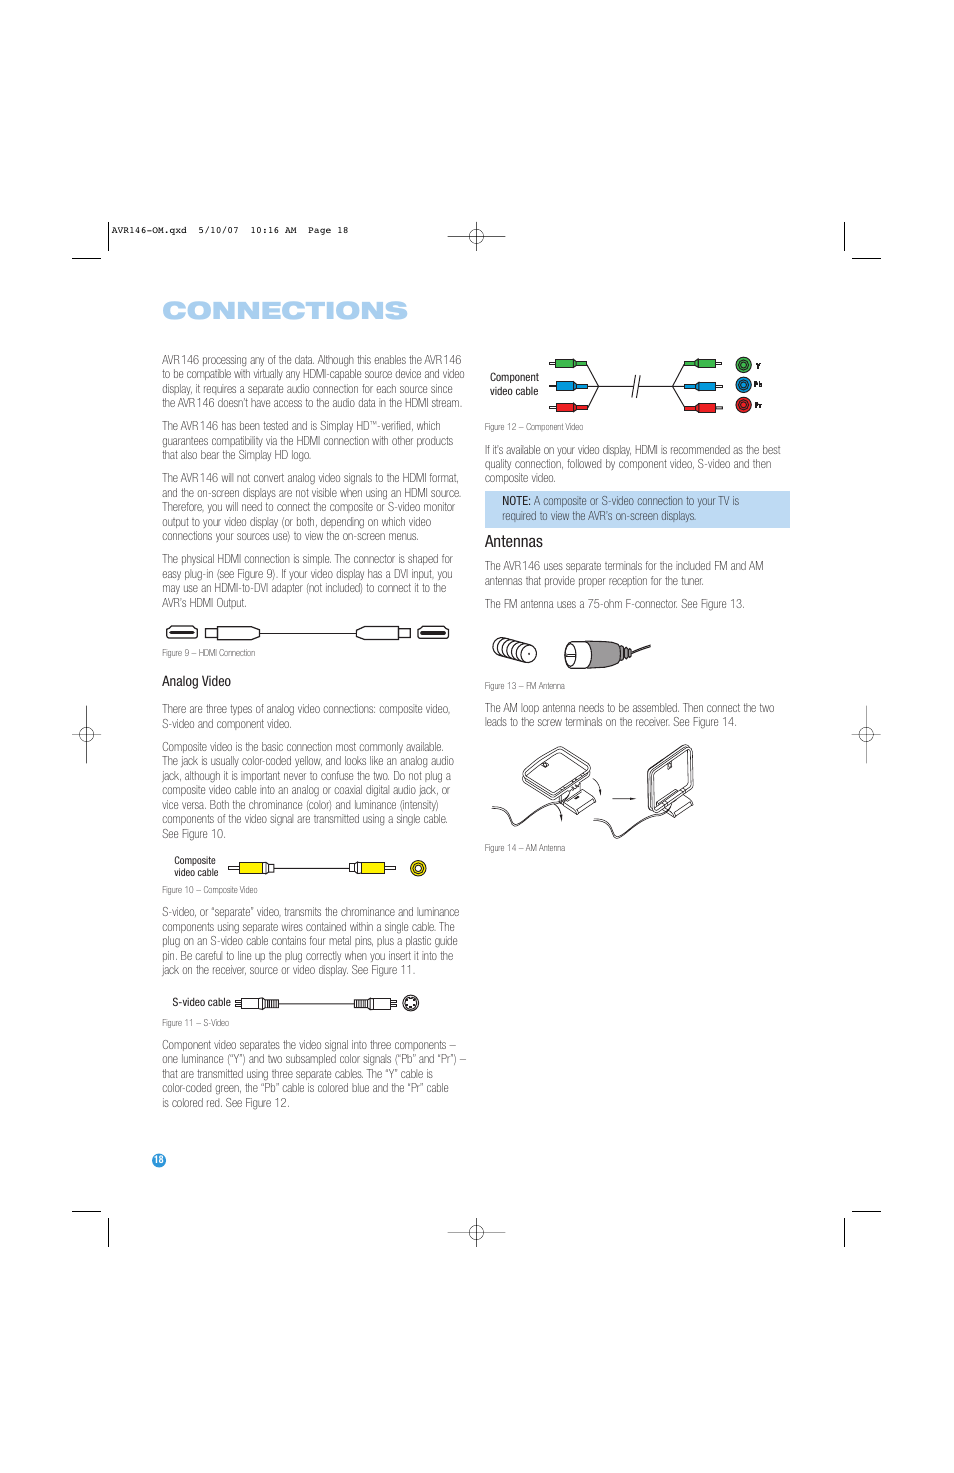 connections antennas harman kardon avr 146 user manual page 18 rh manualsdir com harman kardon avr 146 service manual harman kardon avr 146 manual download